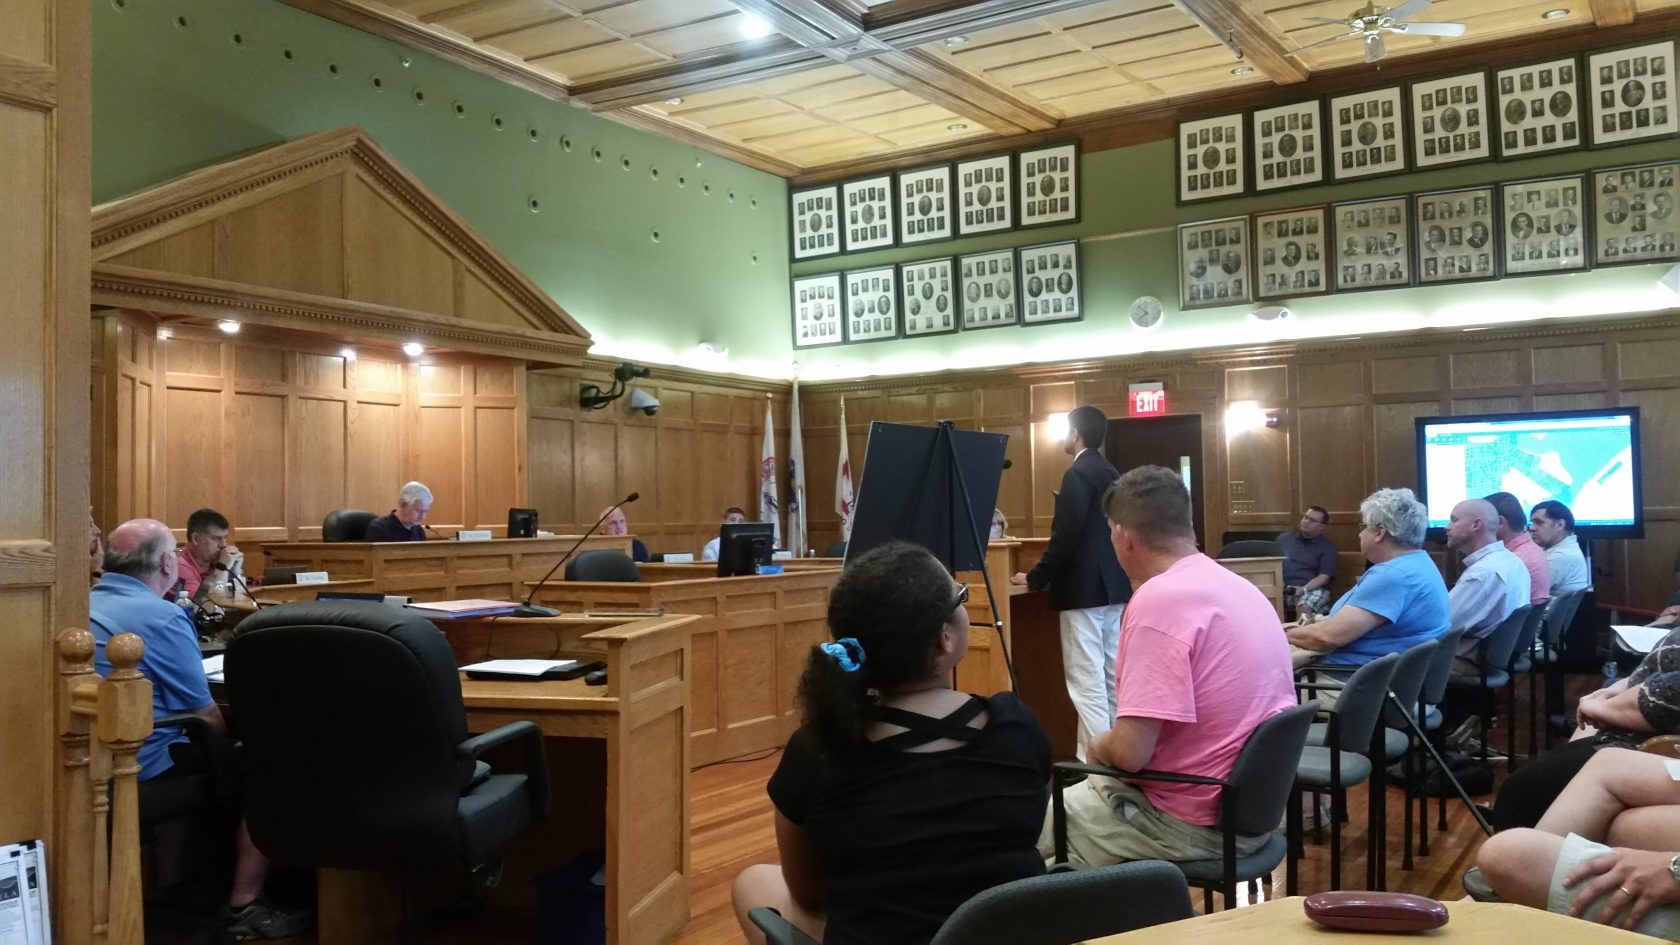 Planning board votes on Little River Road proposal